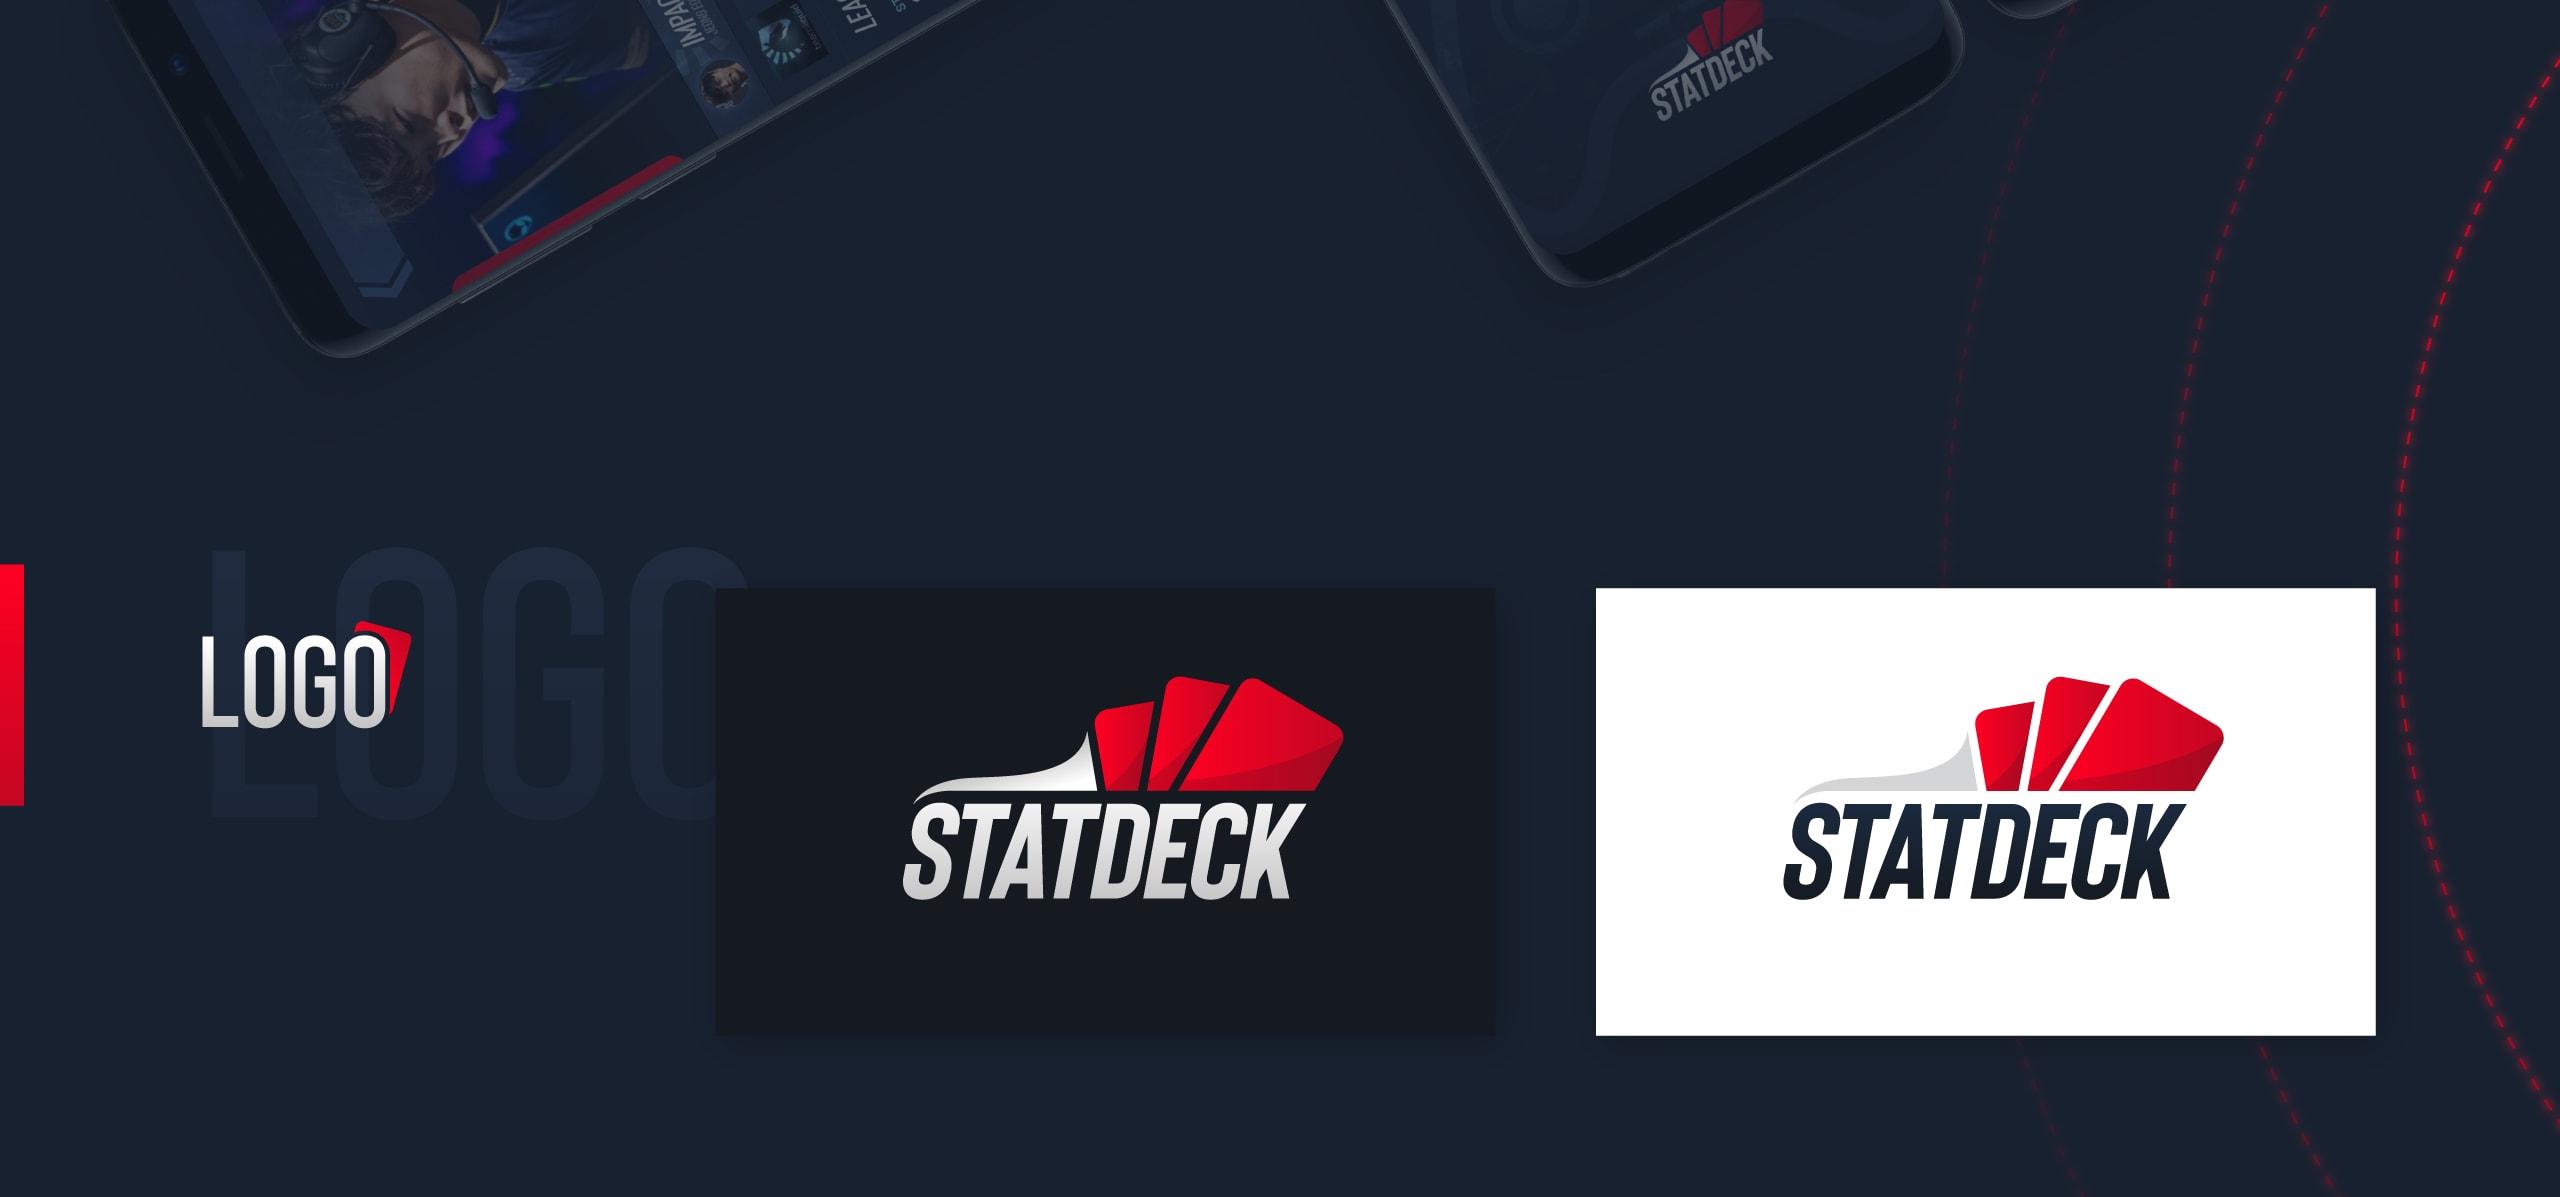 Statdeck screens - logo